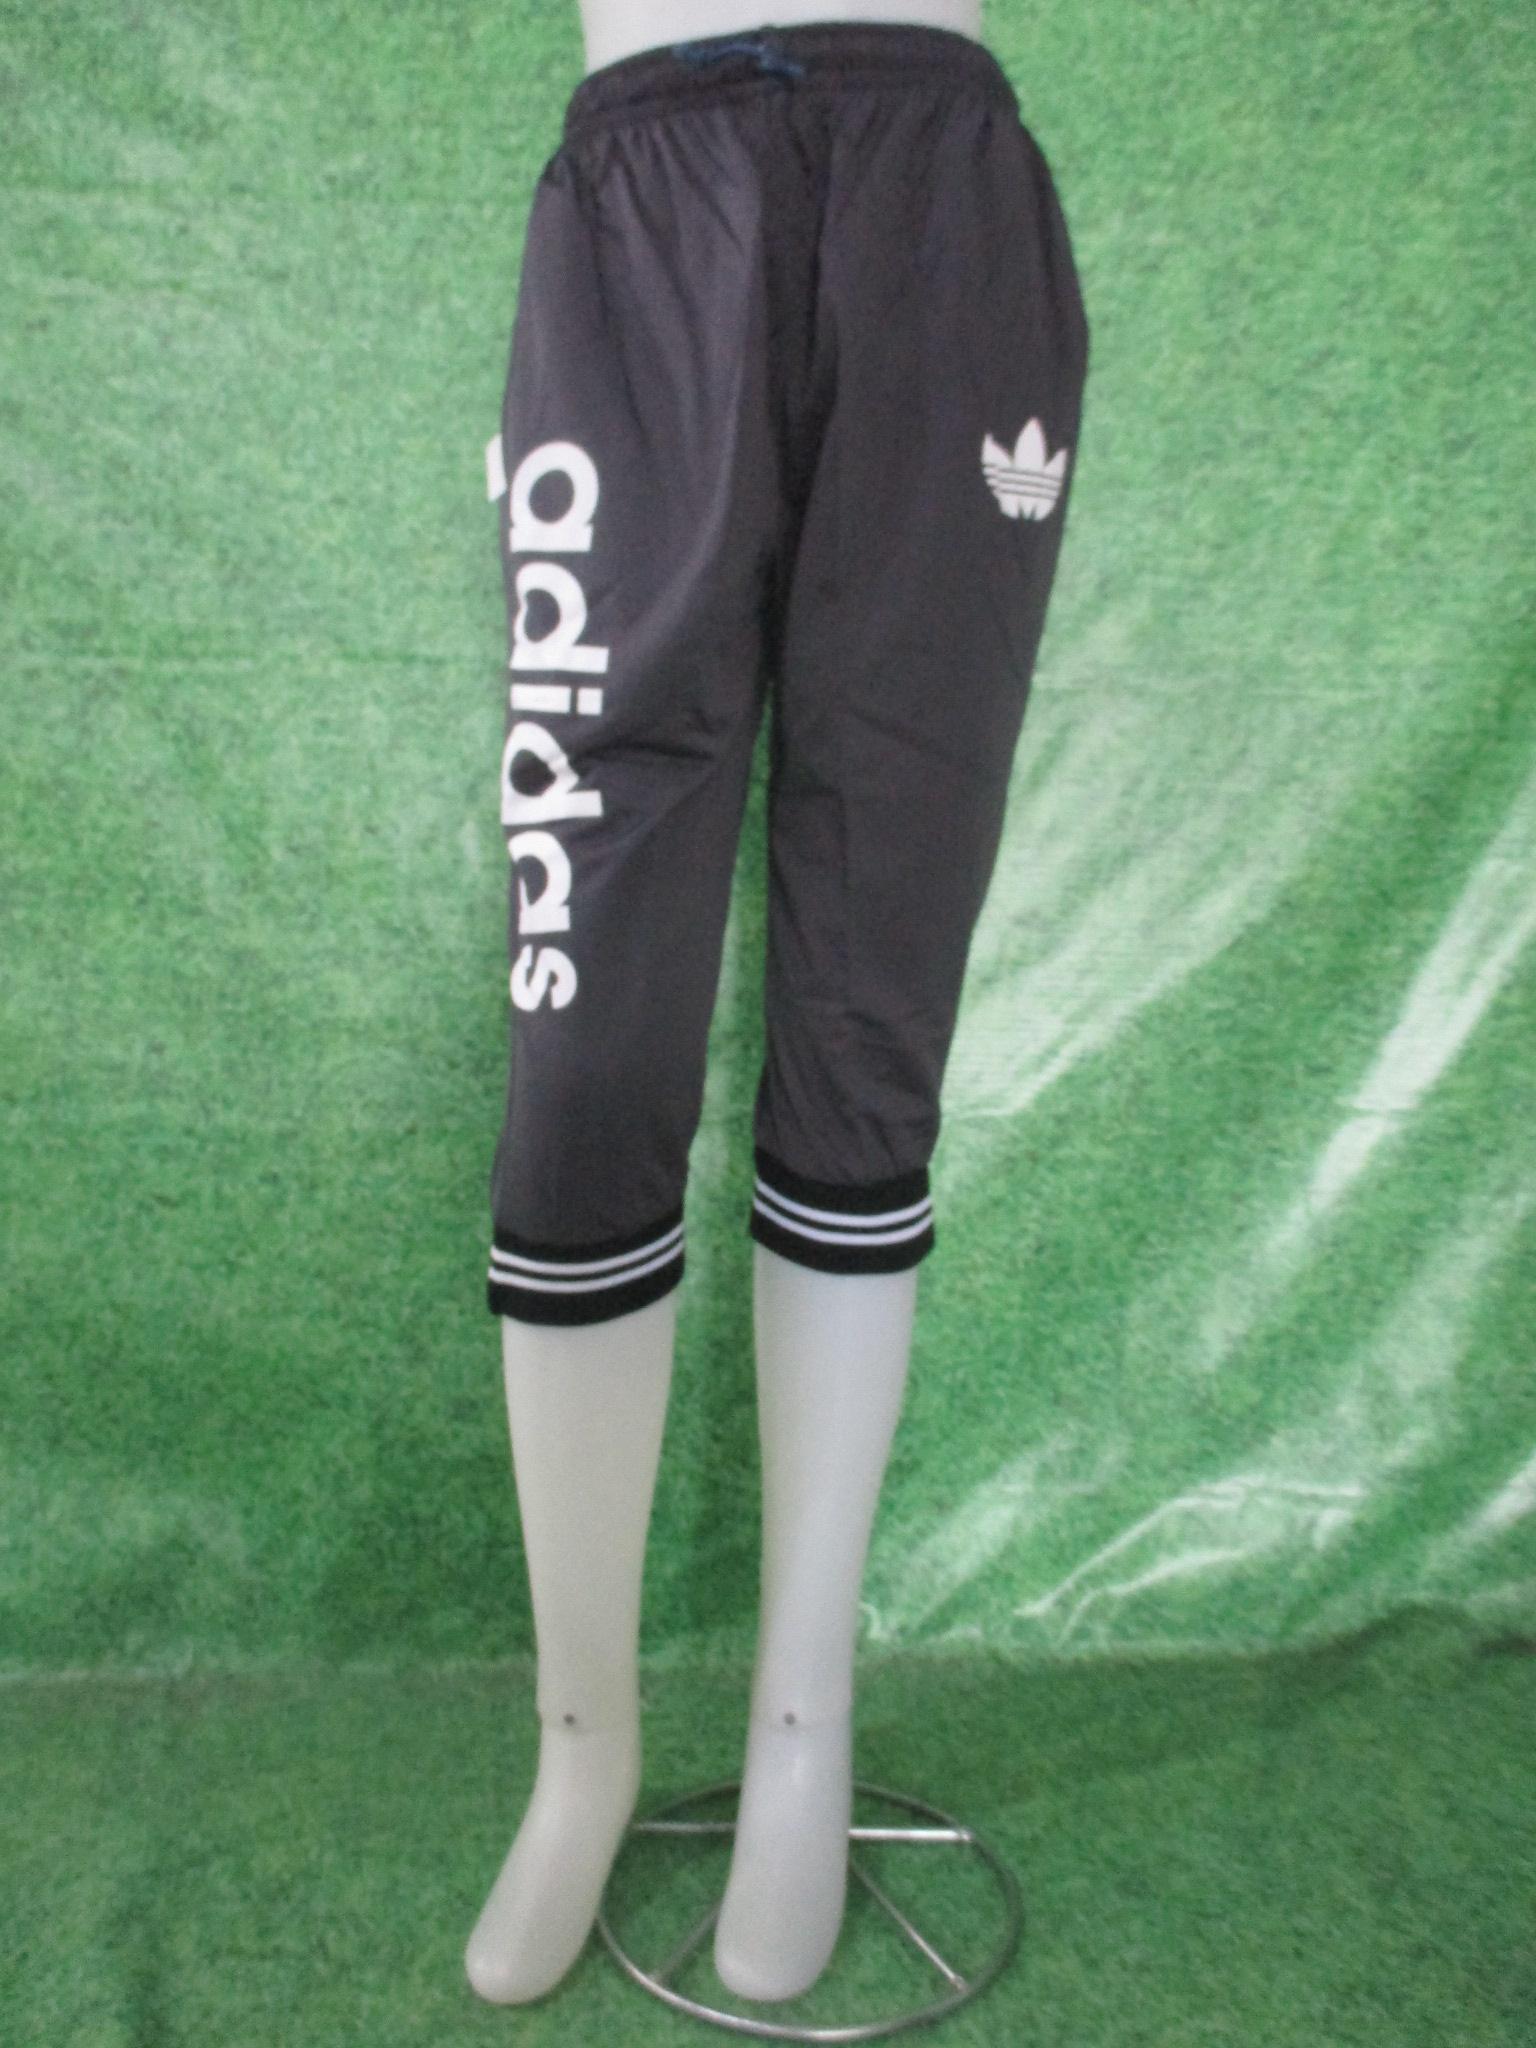 ObralanBaju.com Obral Baju Pakaian Murah Meriah 5000 Jogger Sport Pendek